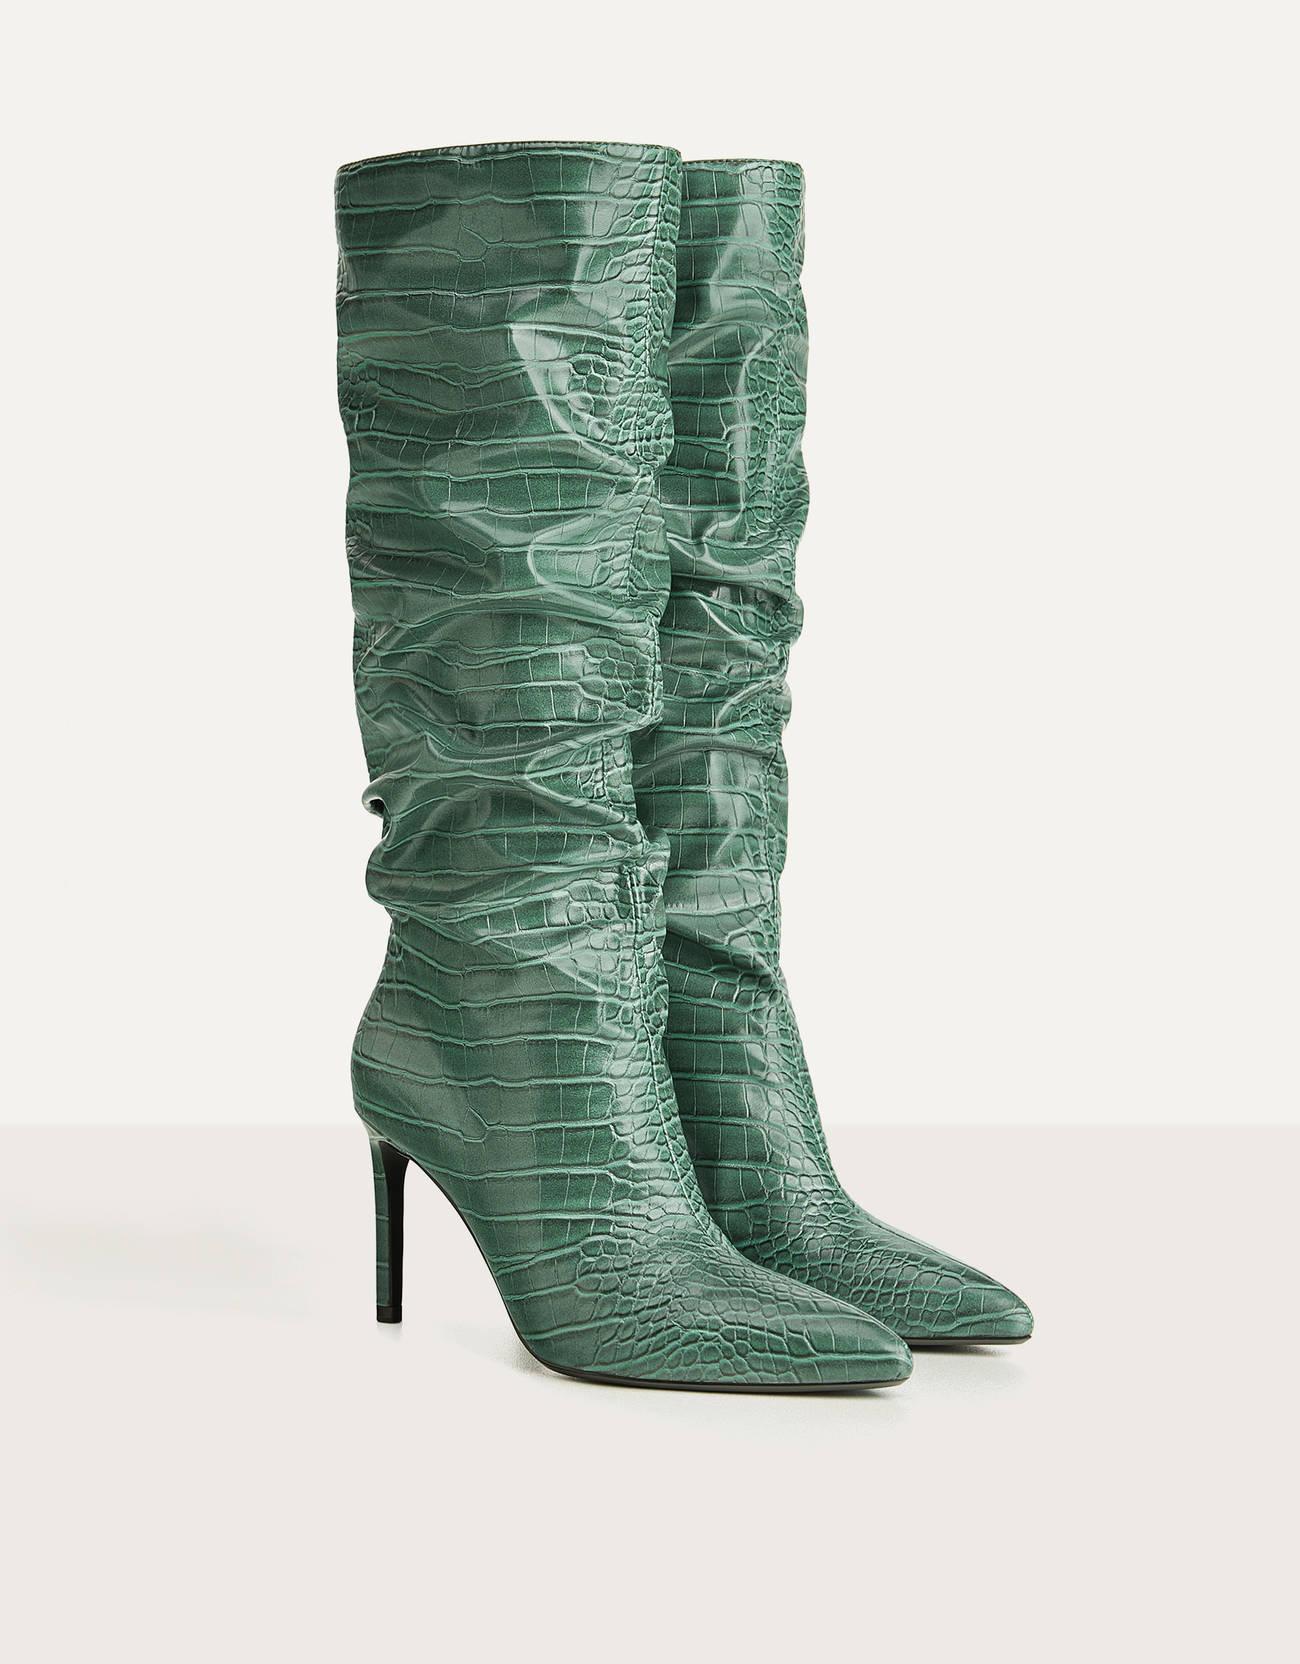 Botas altas verdes de caña arrugada